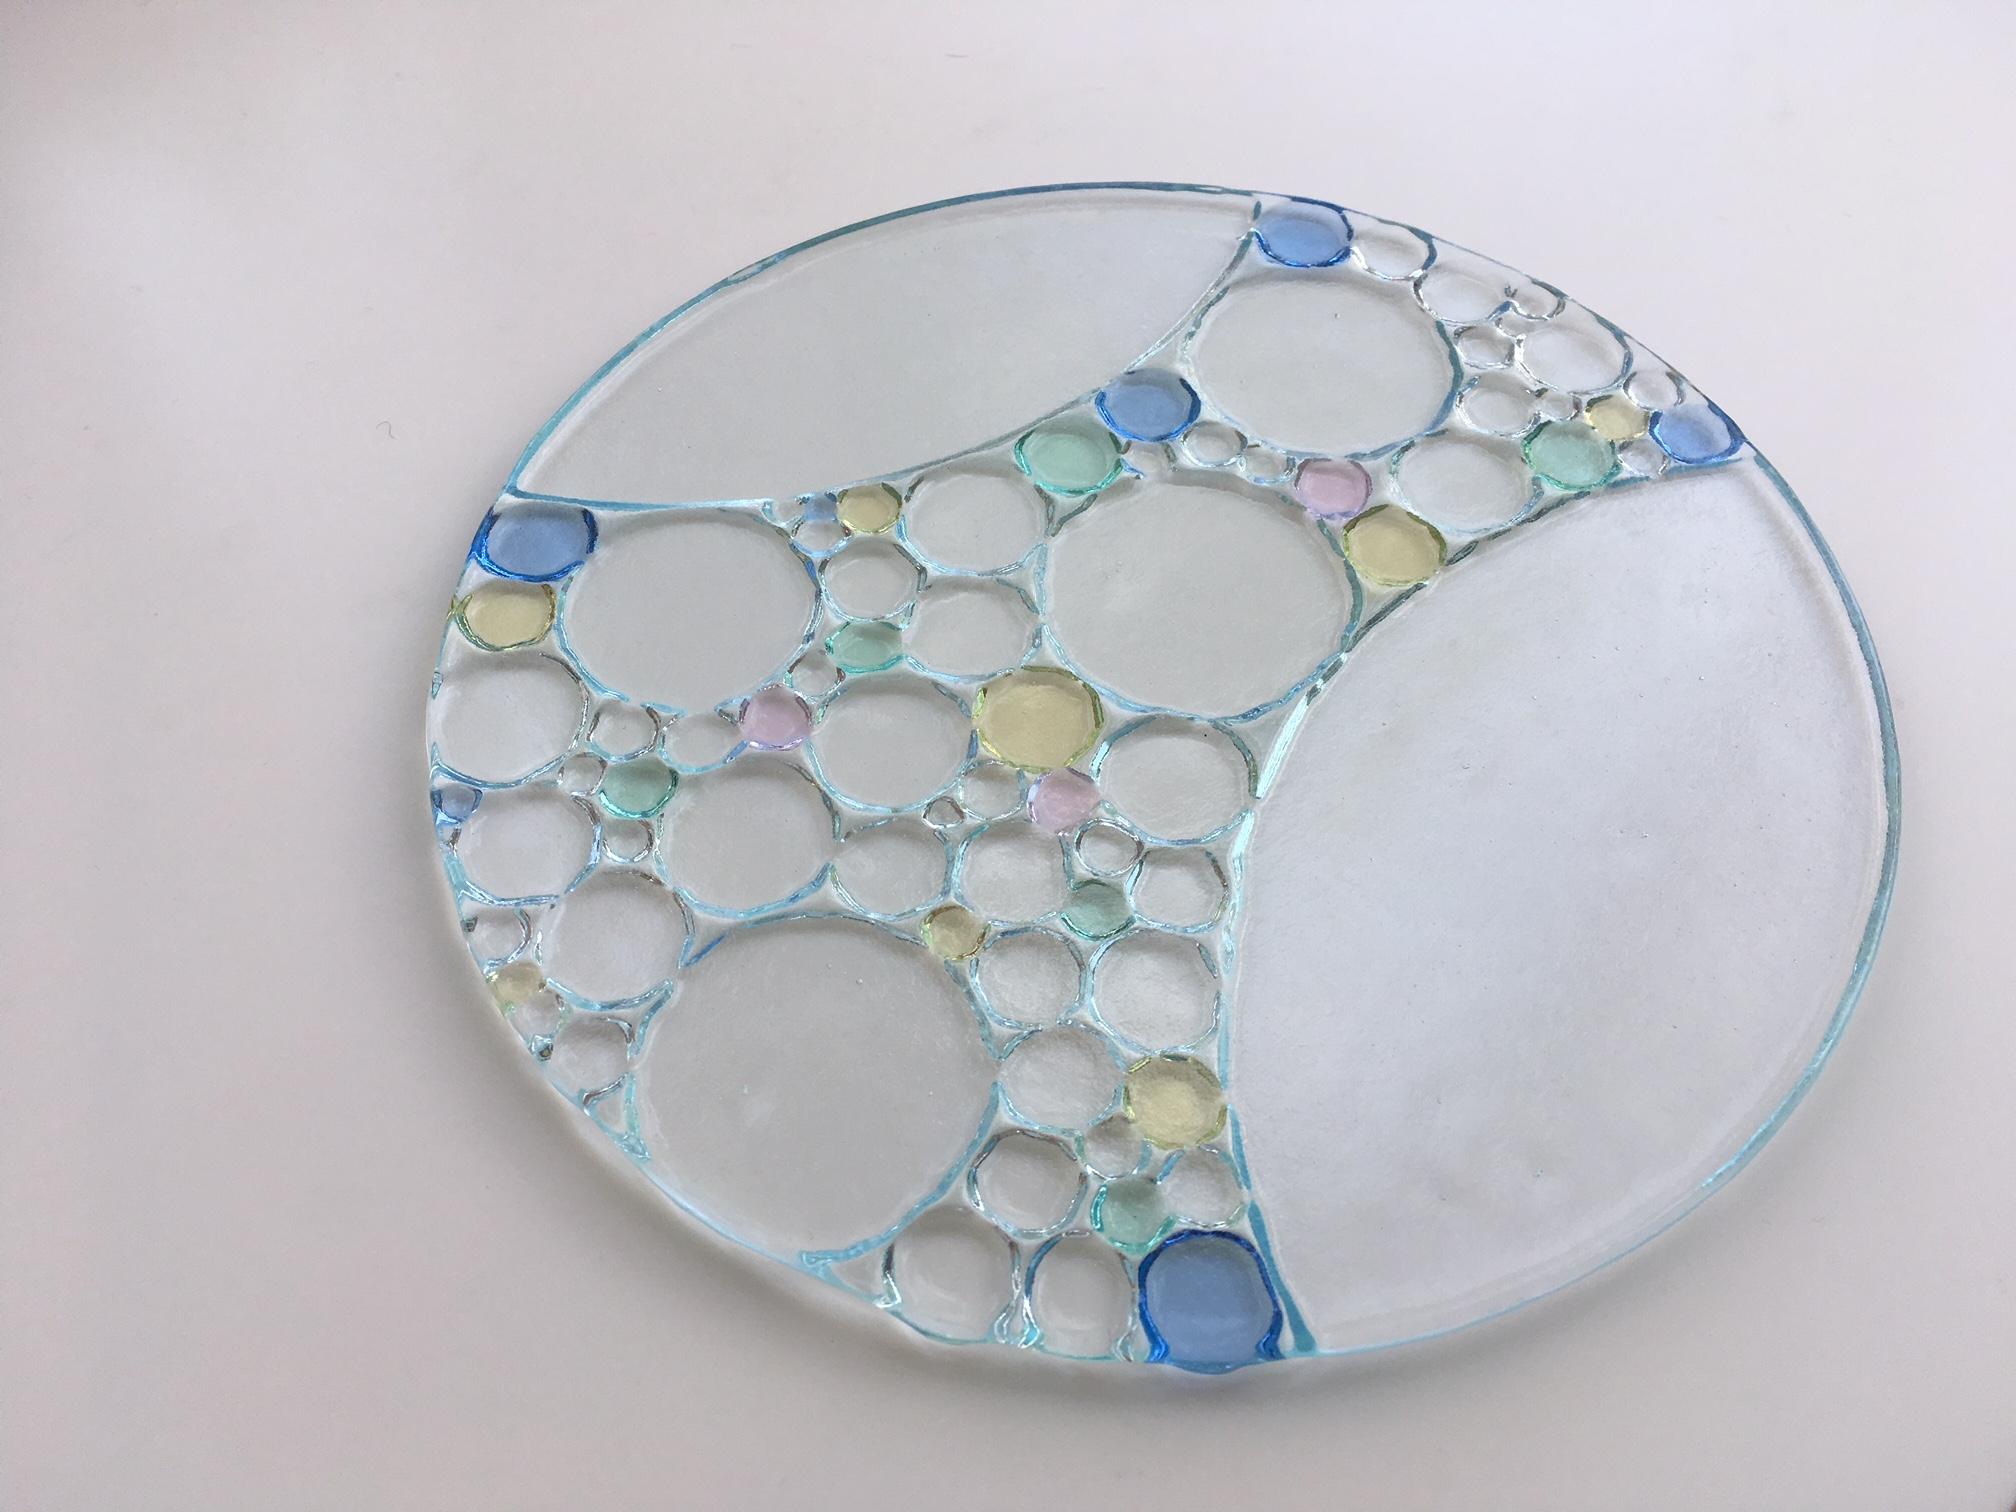 Rikospoppoのお皿